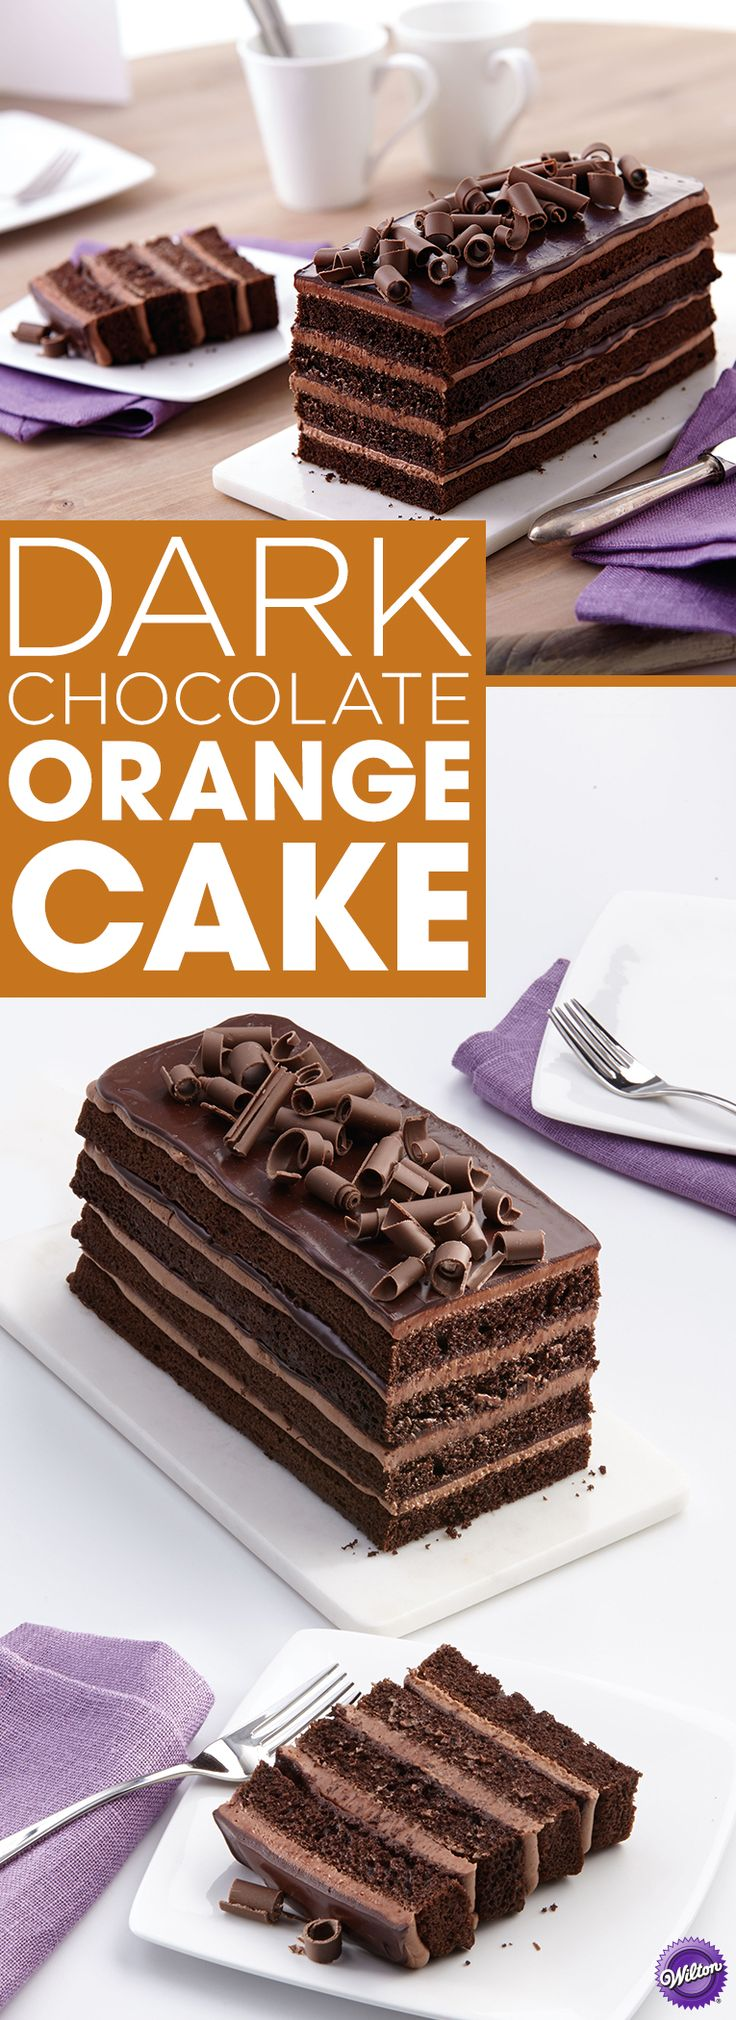 Dark Chocolate Orange Cake Recipe - Dark chocolate and orange are a classic flavor combination. The orange flavor adds a hint of sweetness to the delicious dark chocolate cake and the luscious dark chocolate ganache in this Dark Chocolate Orange Cake.